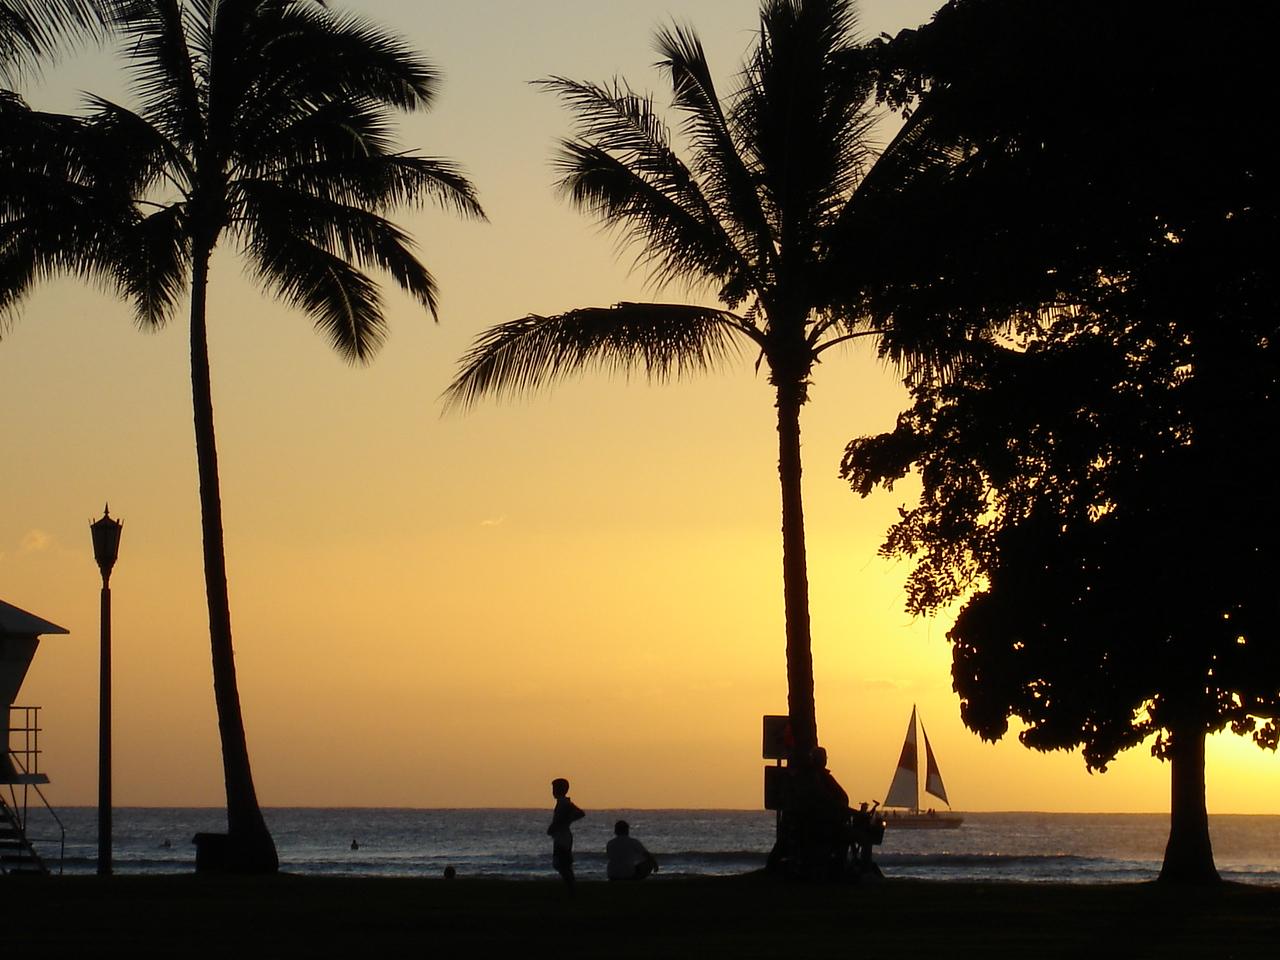 Funerale hawaiano, come si svolge